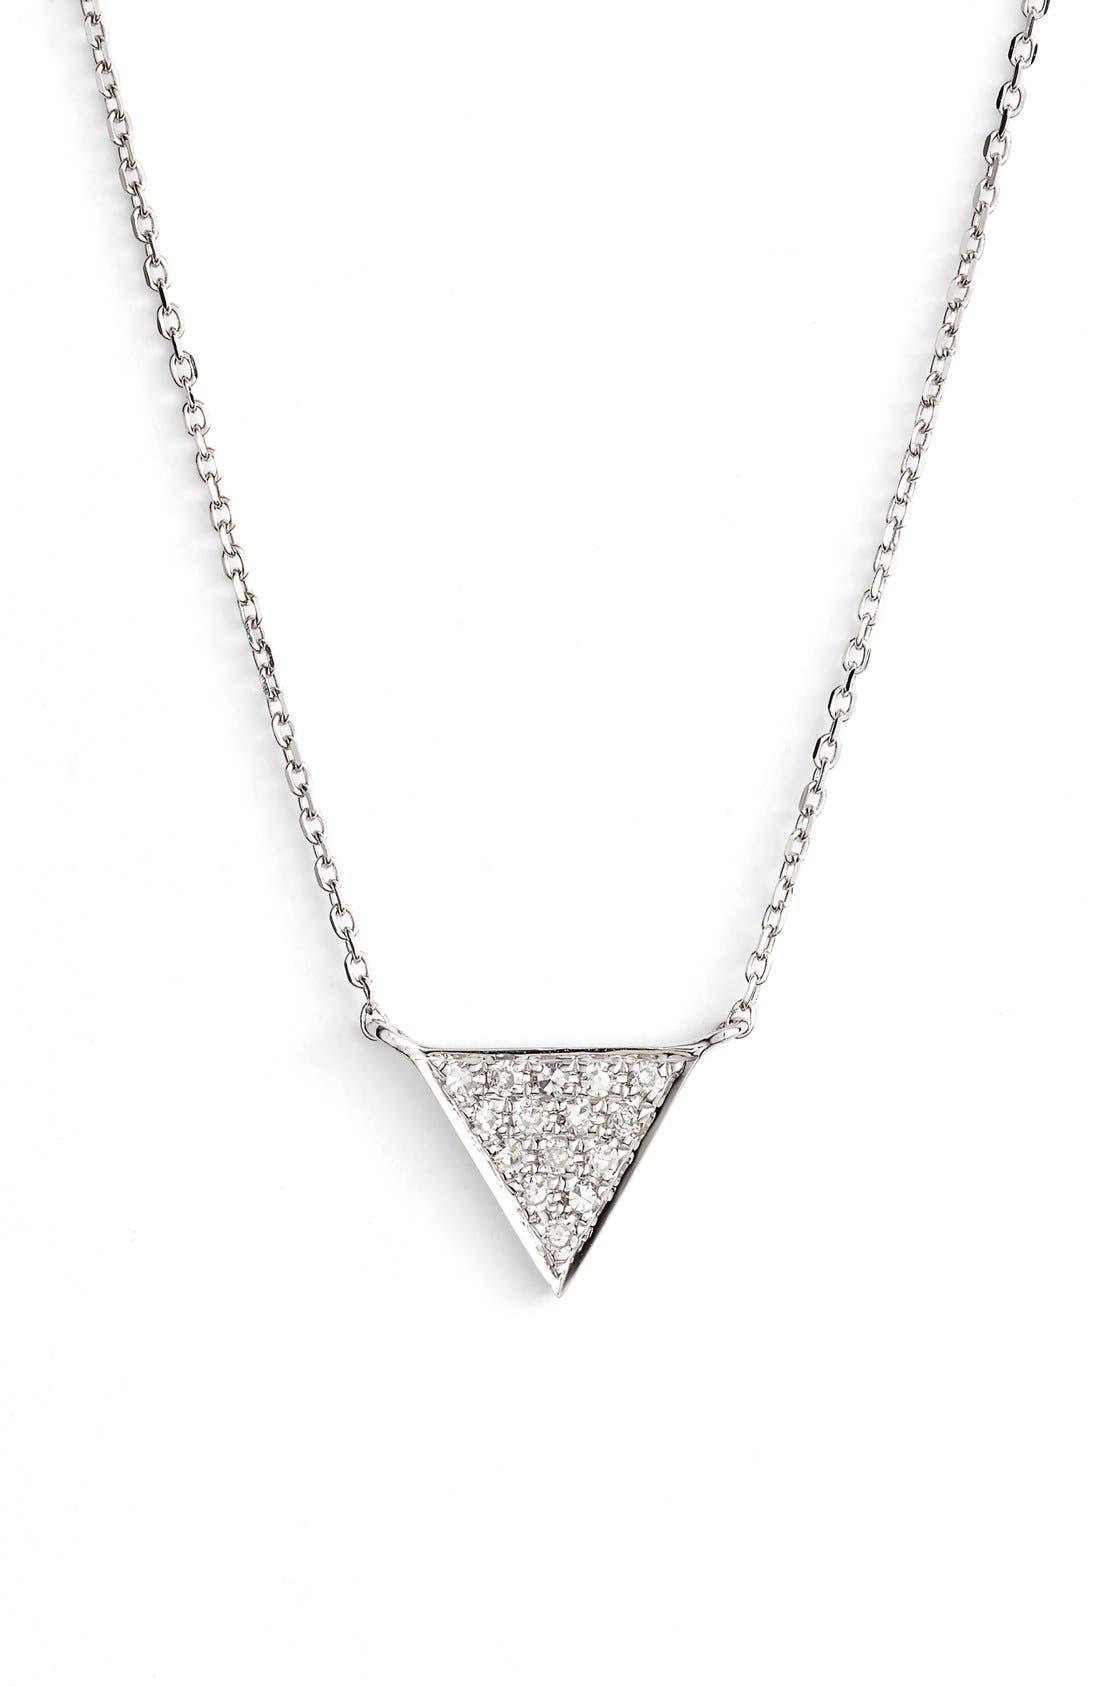 Main Image - Dana Rebecca Designs 'Emily Sarah' Diamond Triangle Pendant Necklace